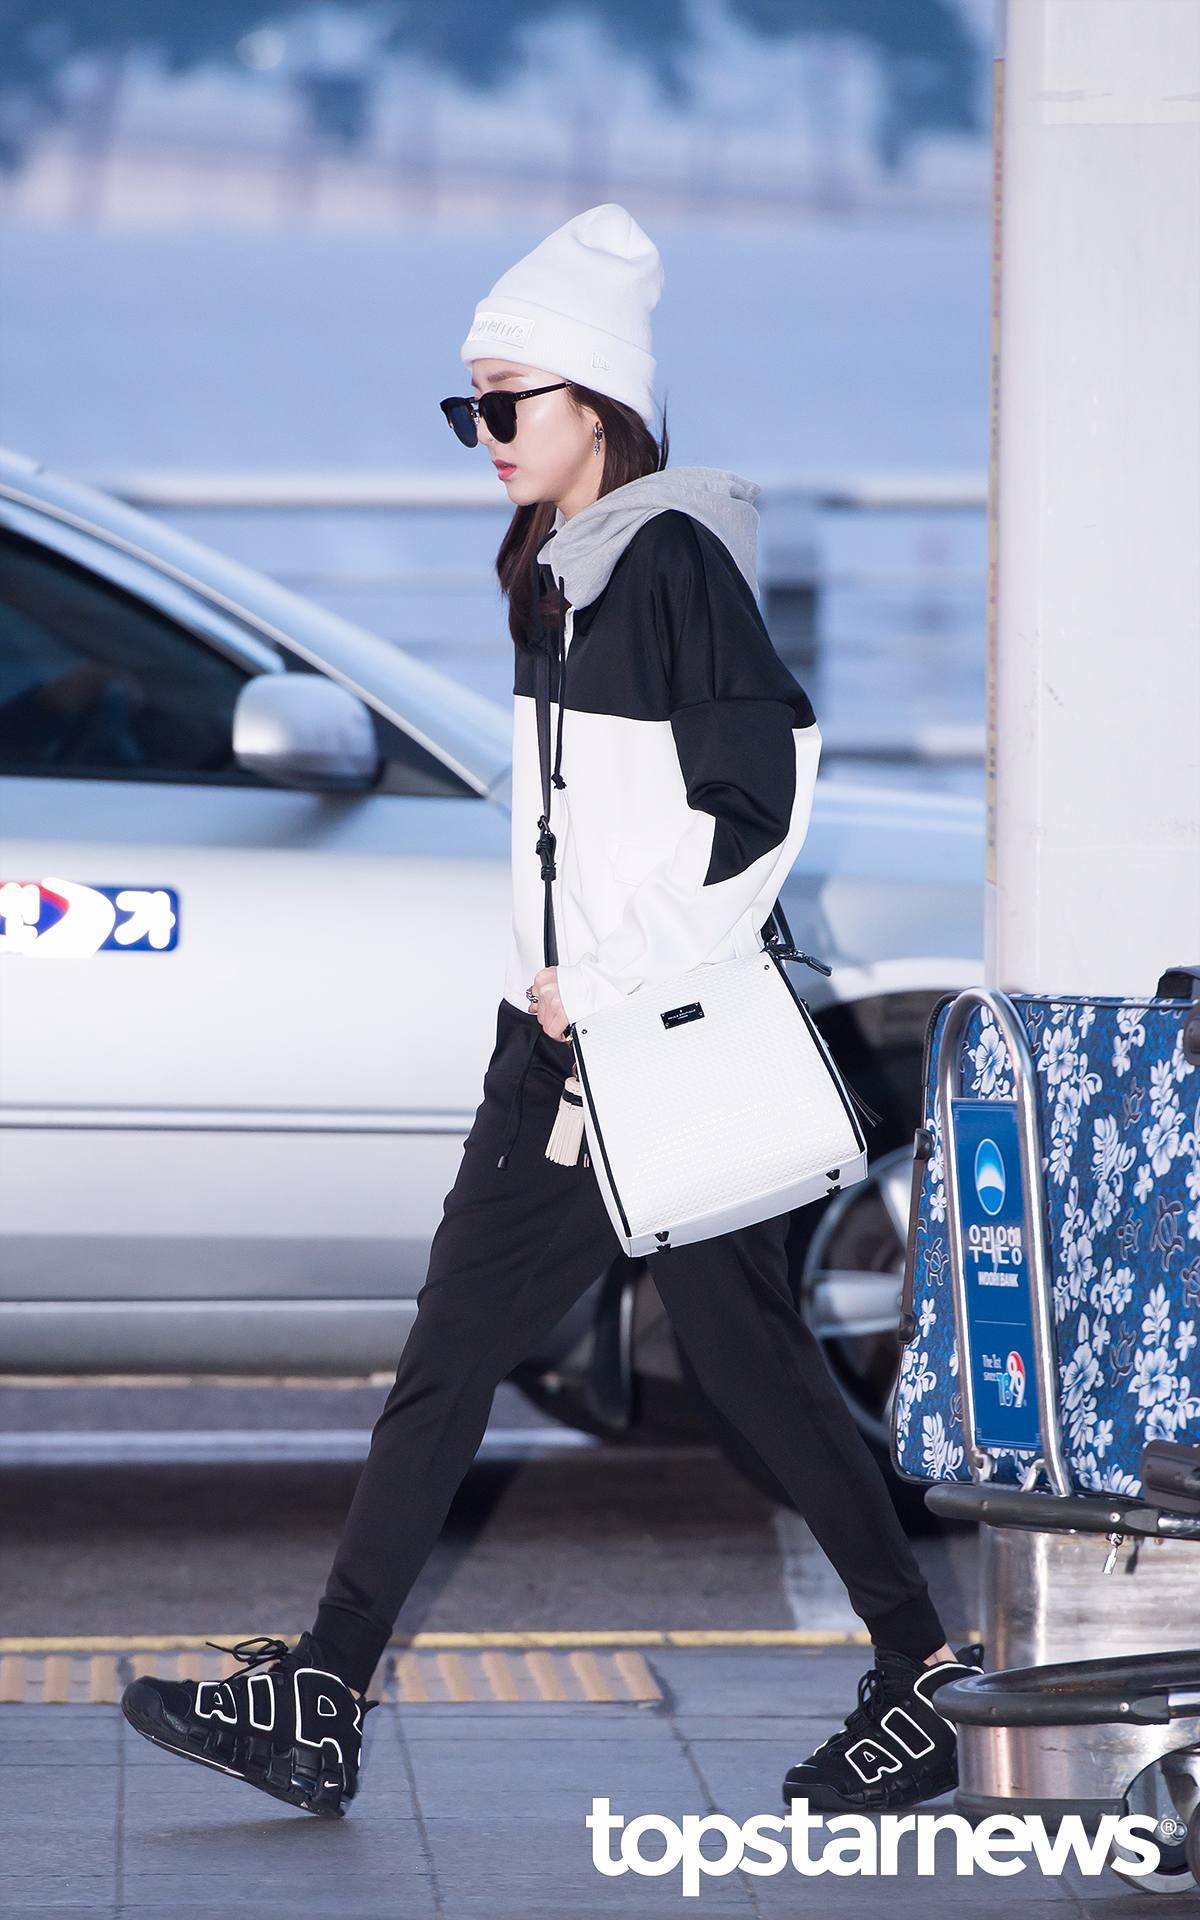 2NE1 - Dara 側面一看,這完全算是紙片人了吧